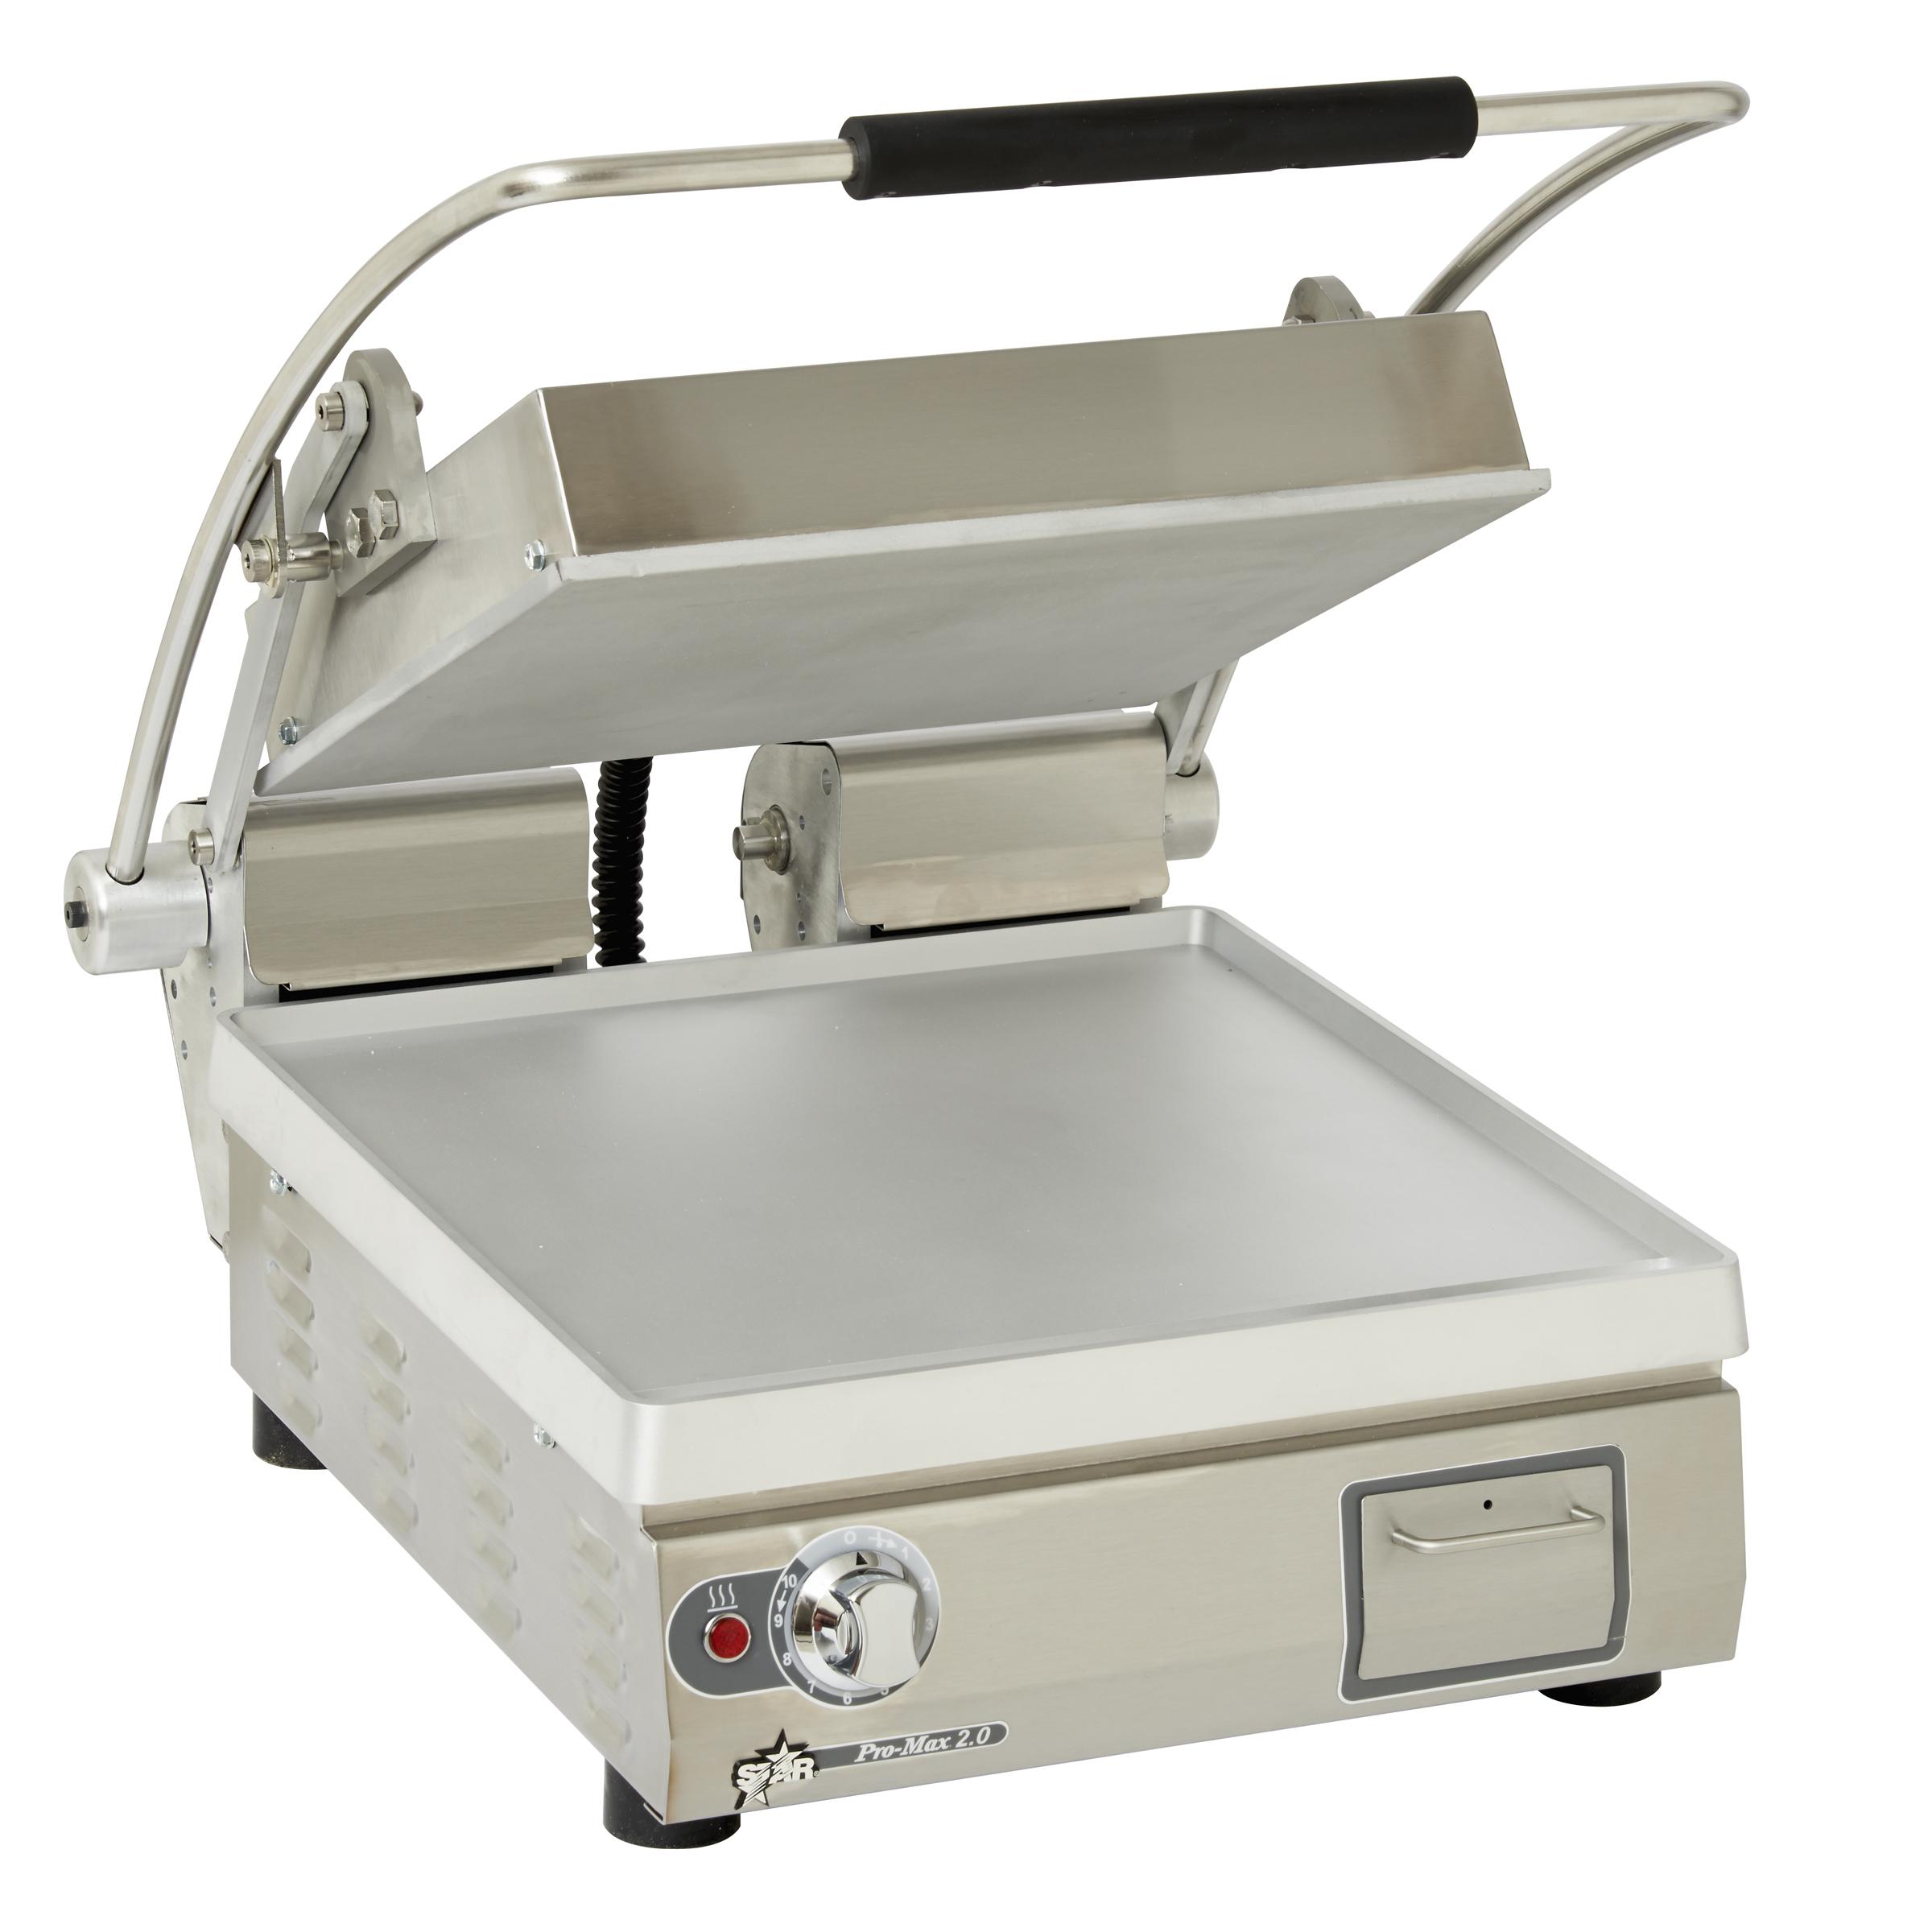 Star PST14 sandwich / panini grill